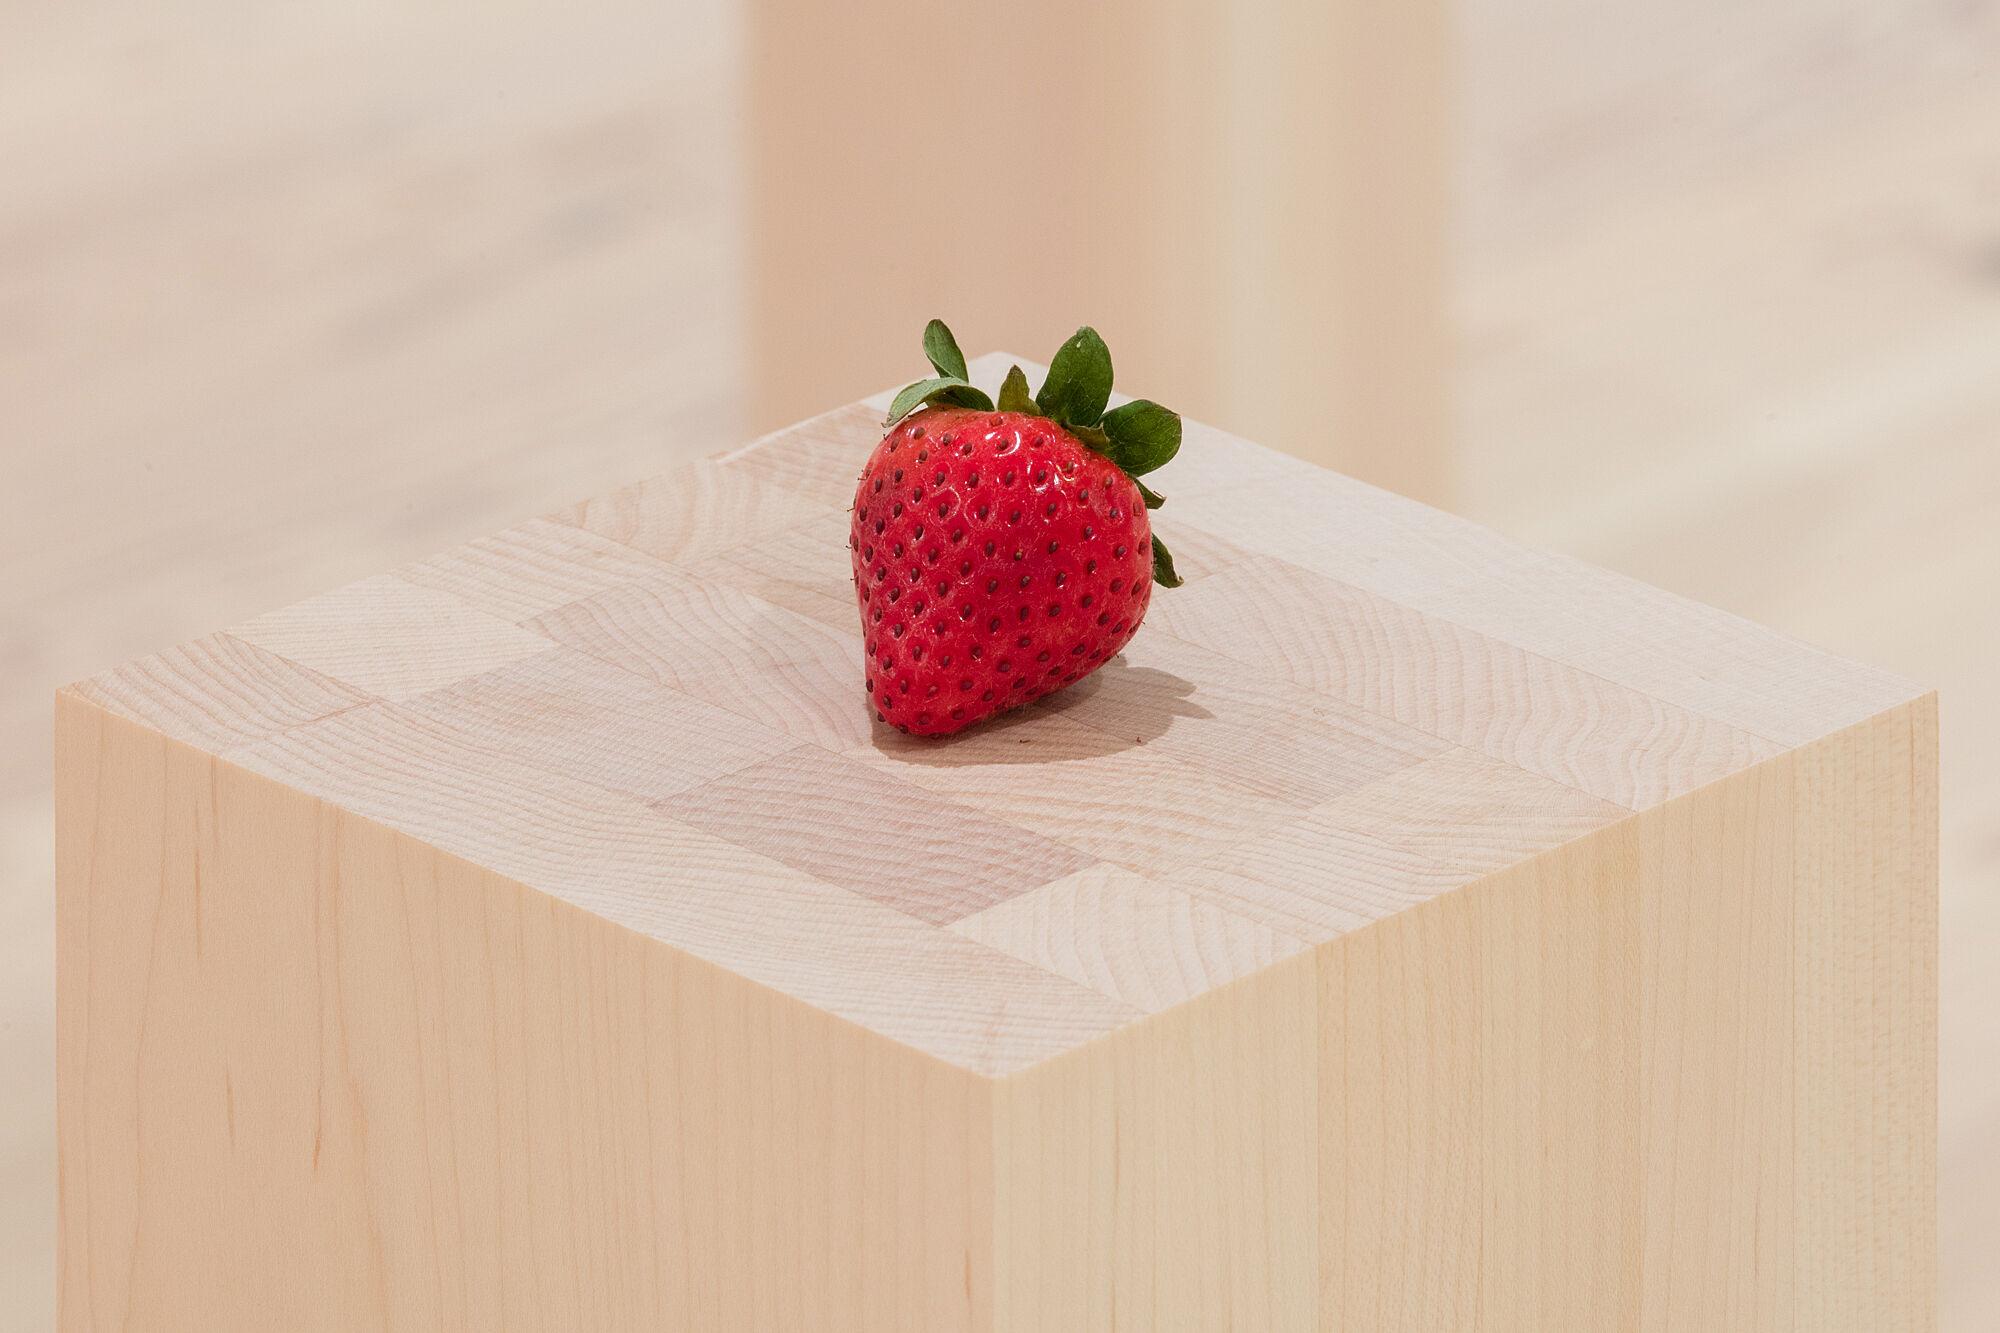 A photo of a strawberry on a plinth.